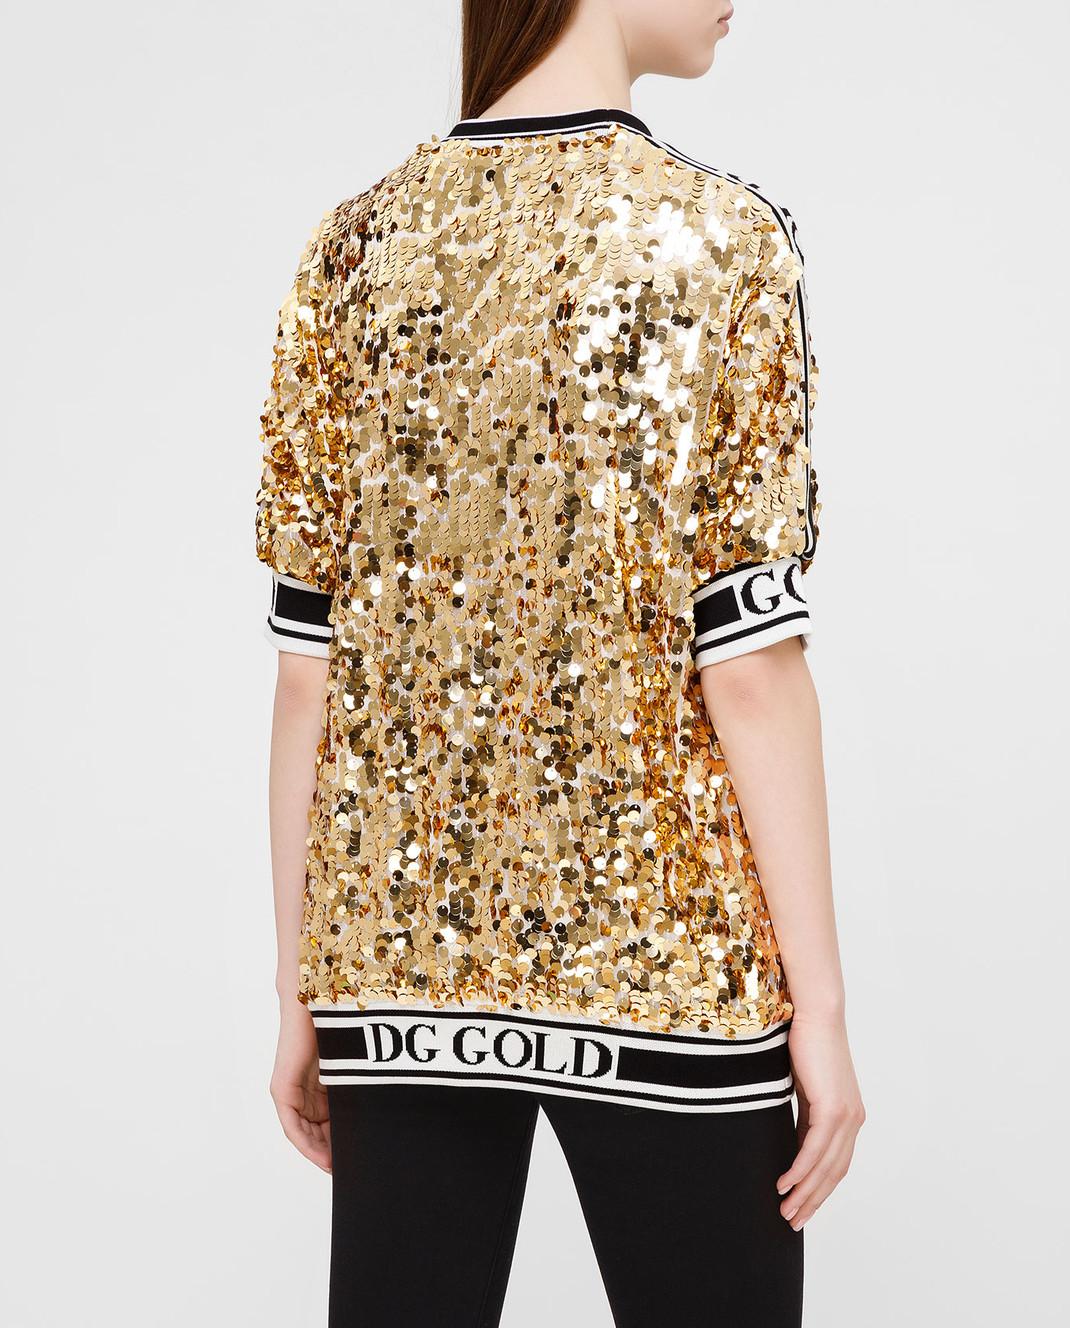 Dolce&Gabbana Золотистая футболка изображение 4